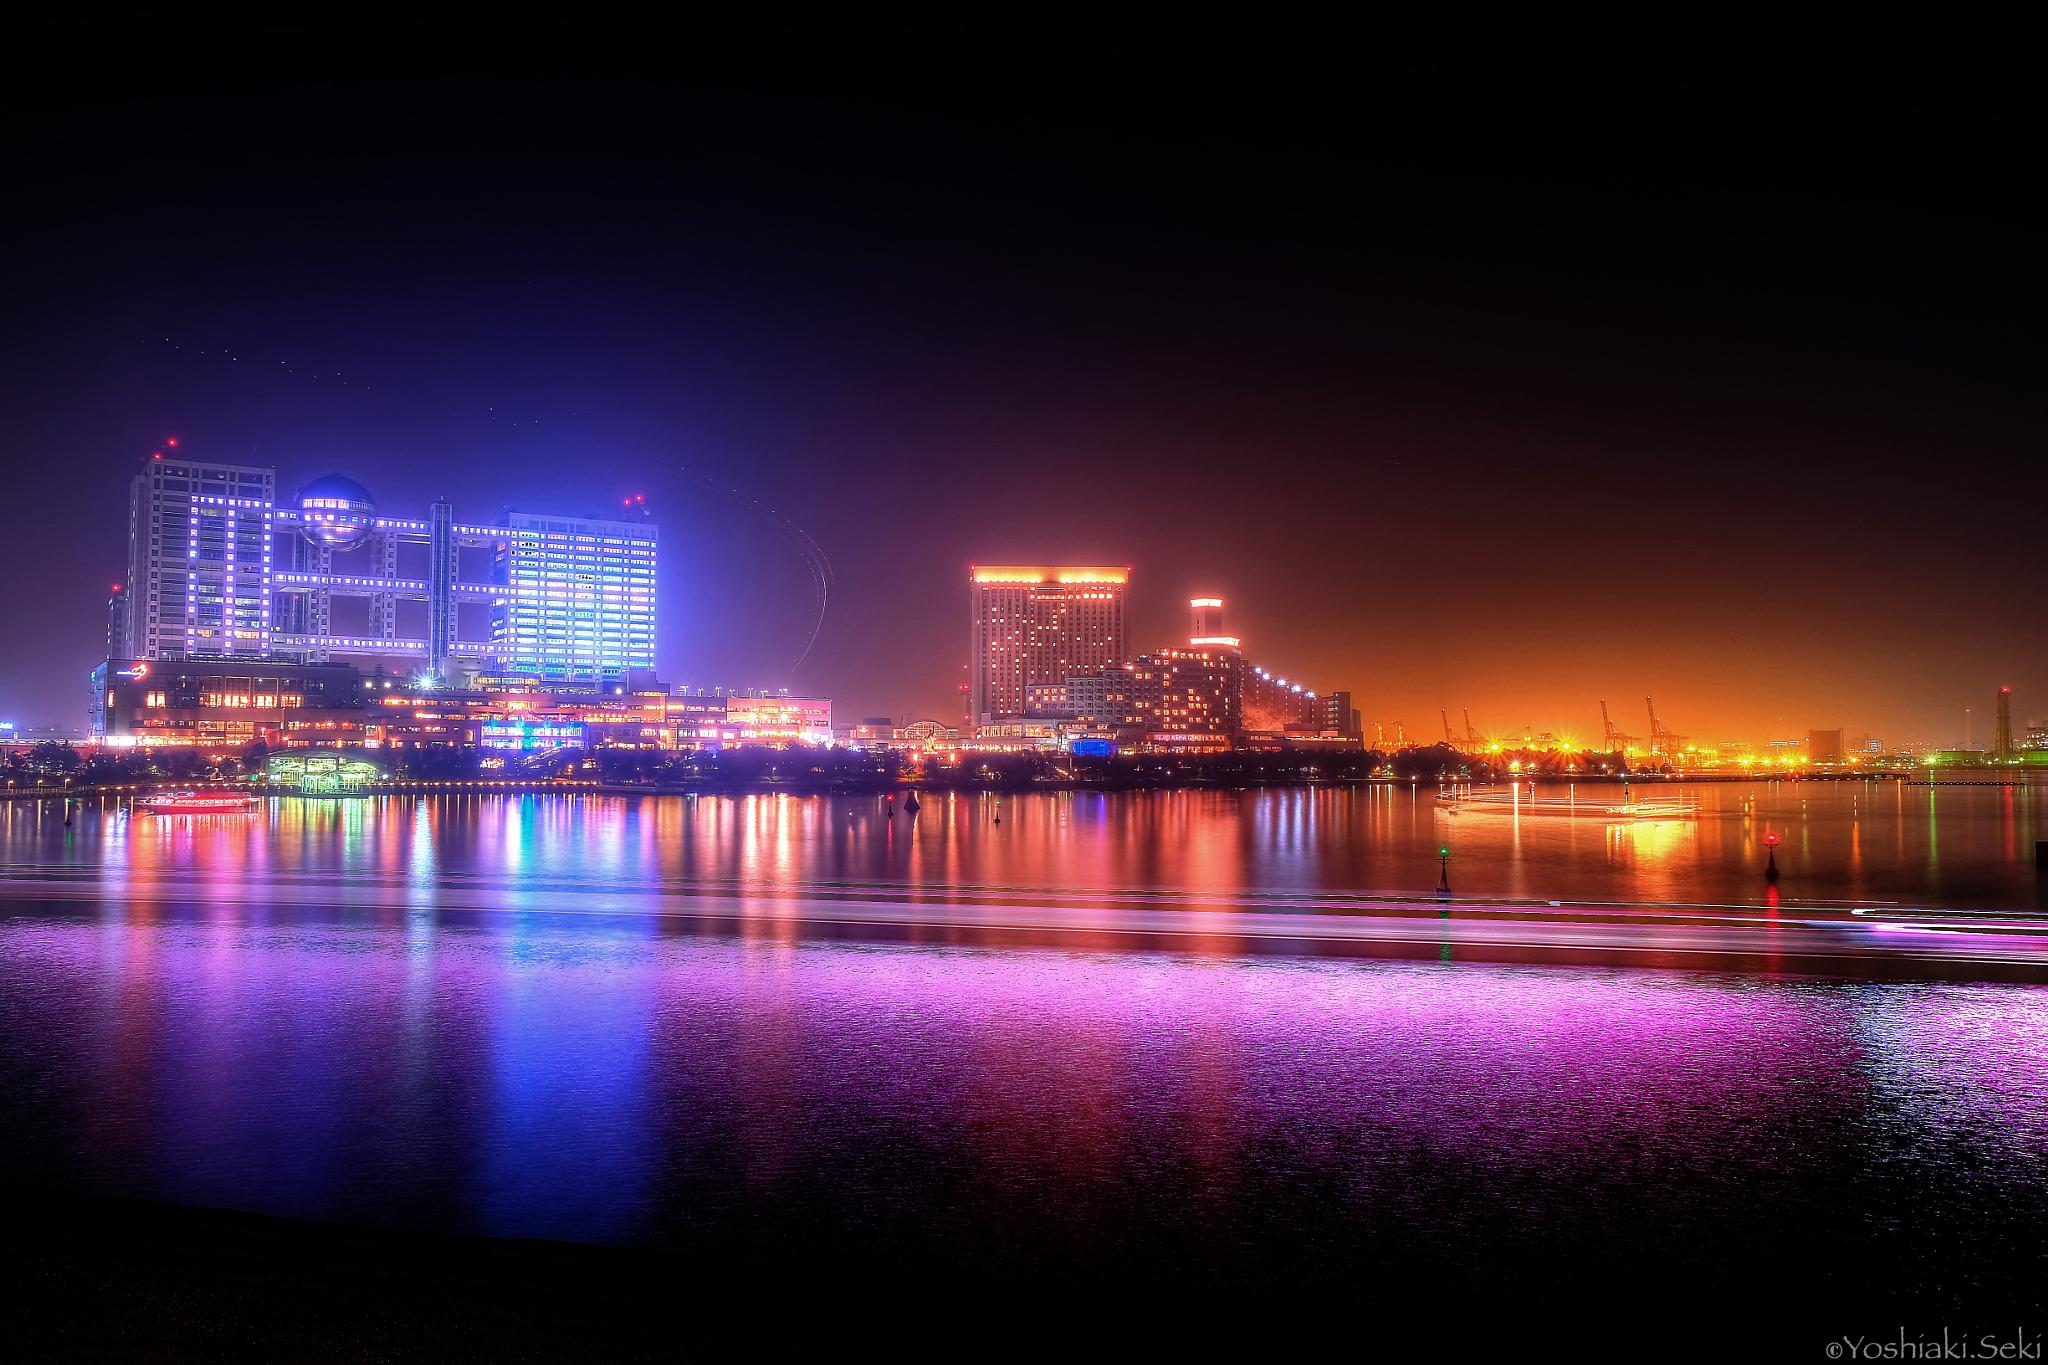 Odaiba Night〔taken with fluorescent light〕 by Yoshiaki Seki